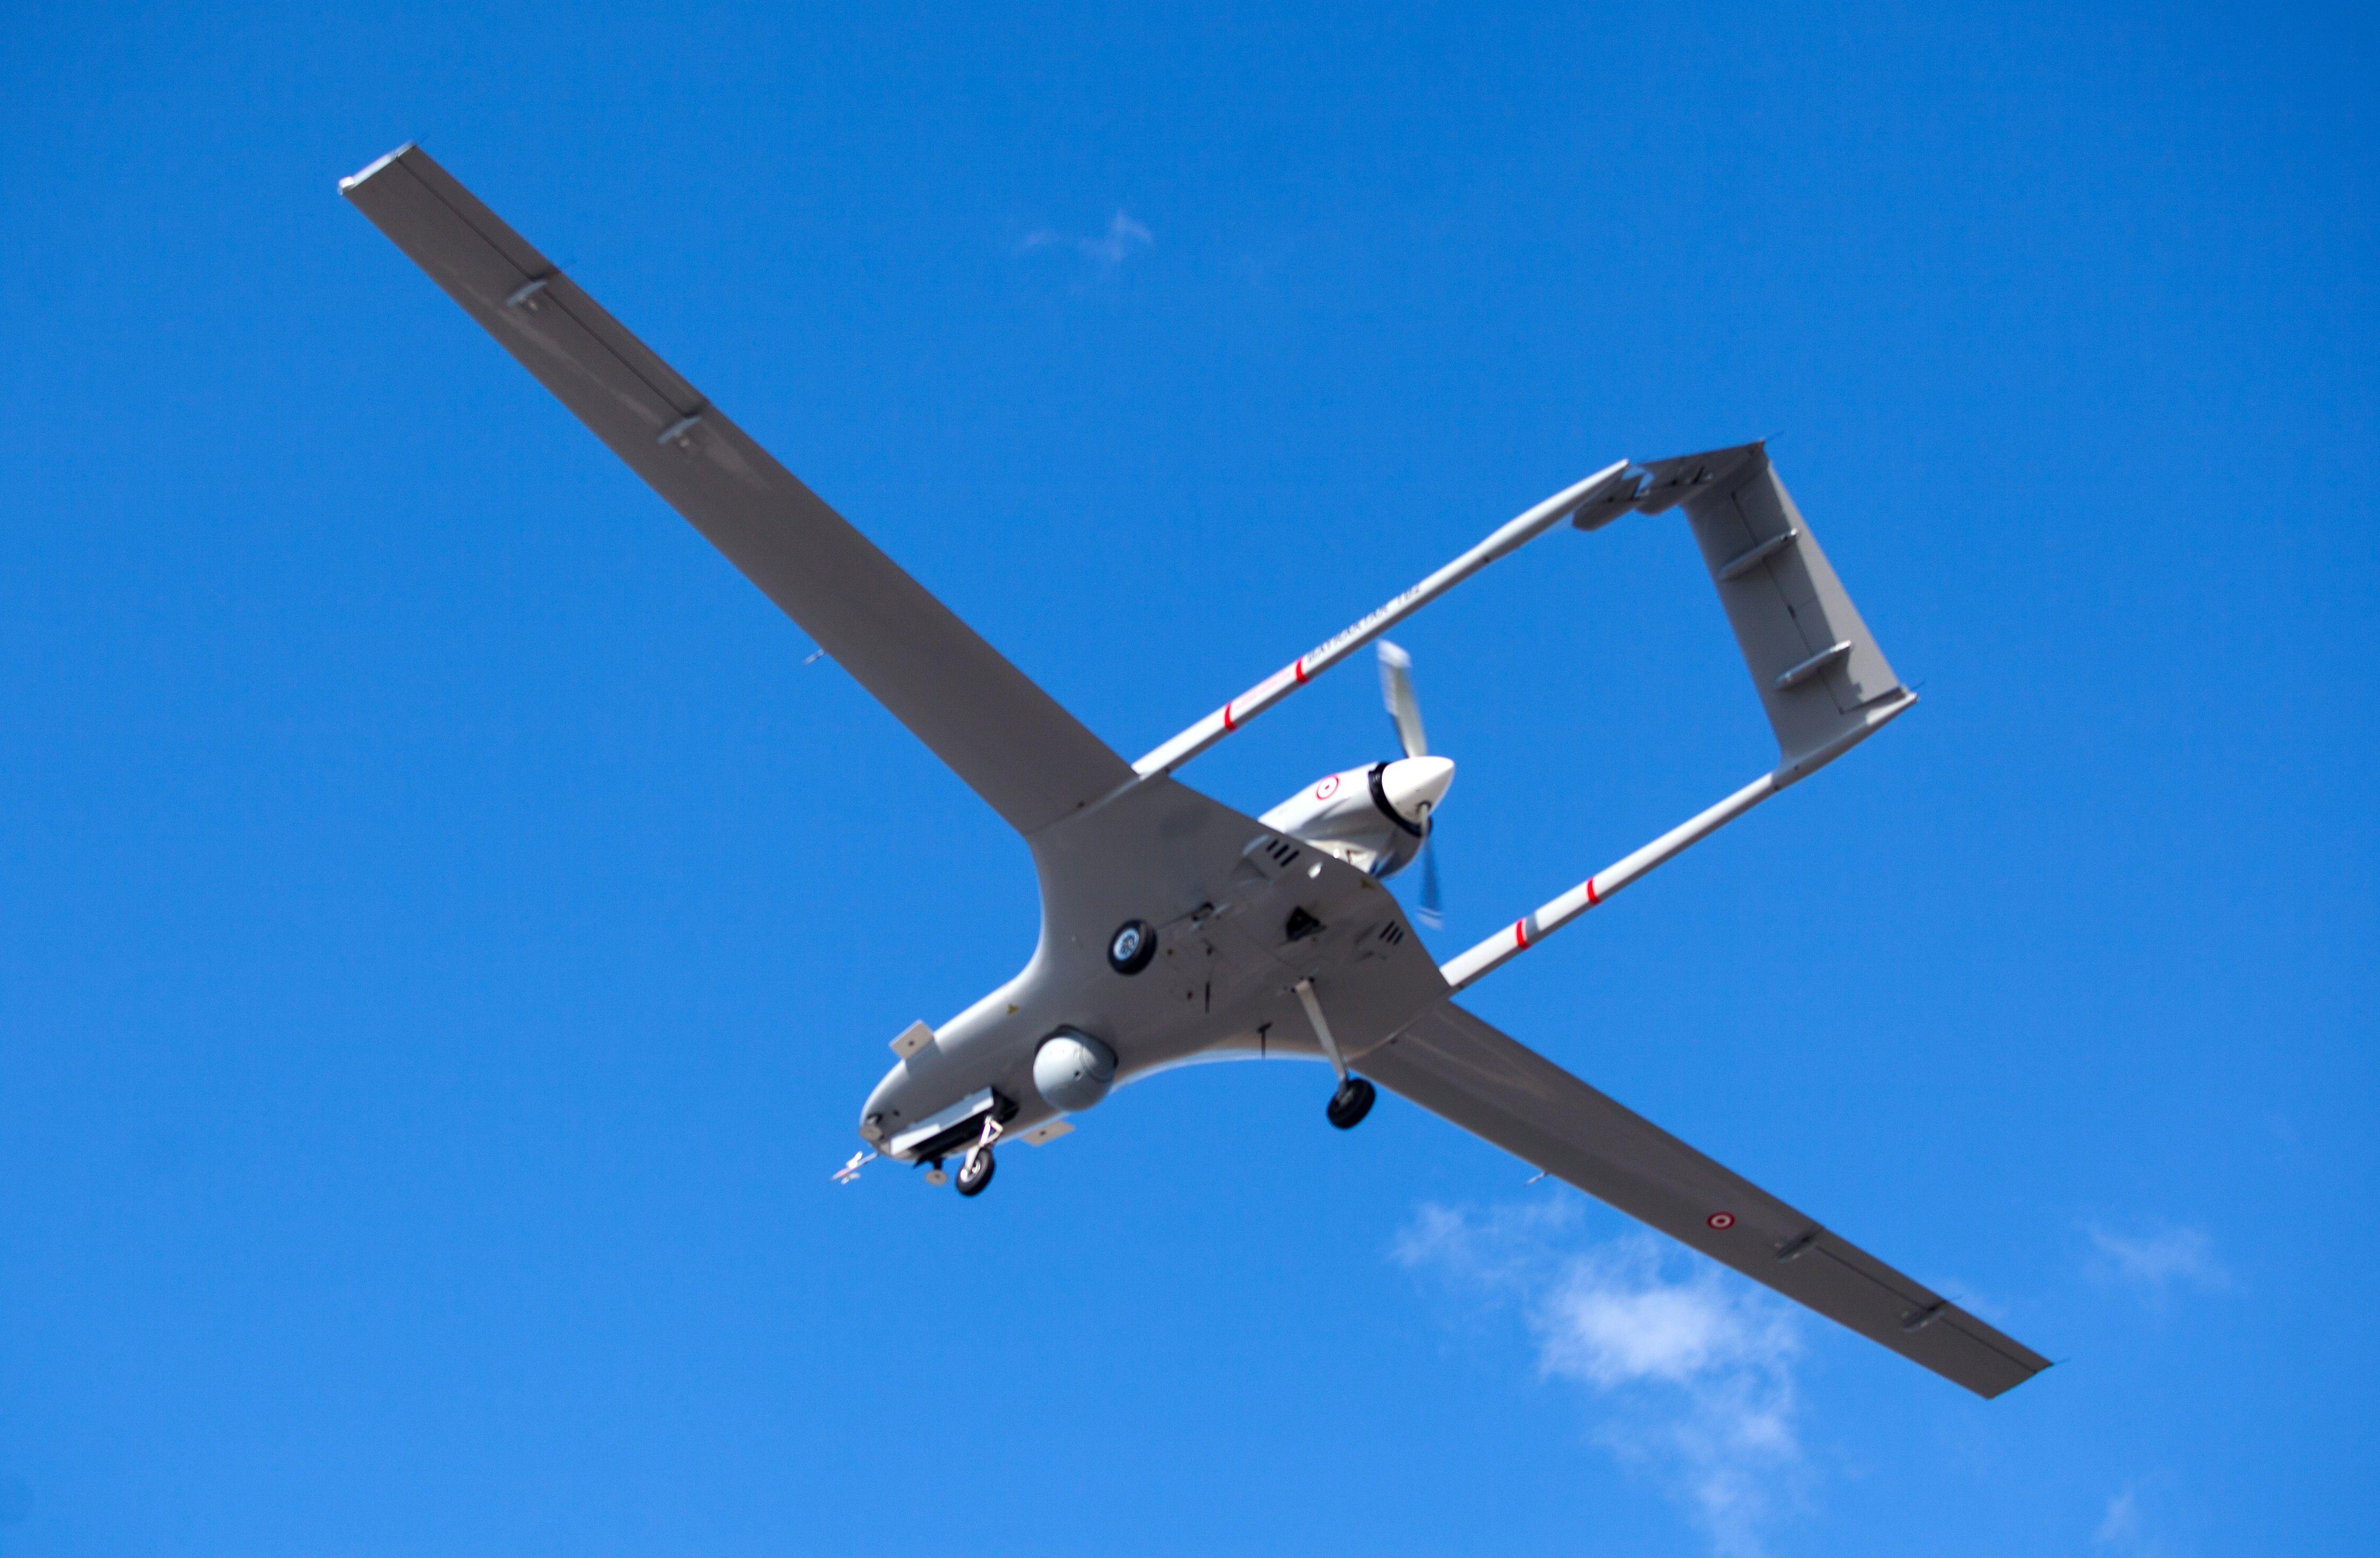 A Turkish-made TB2 drone flies on Dec, 16, 2019. (Birol Bebek/AFP via Getty Images)